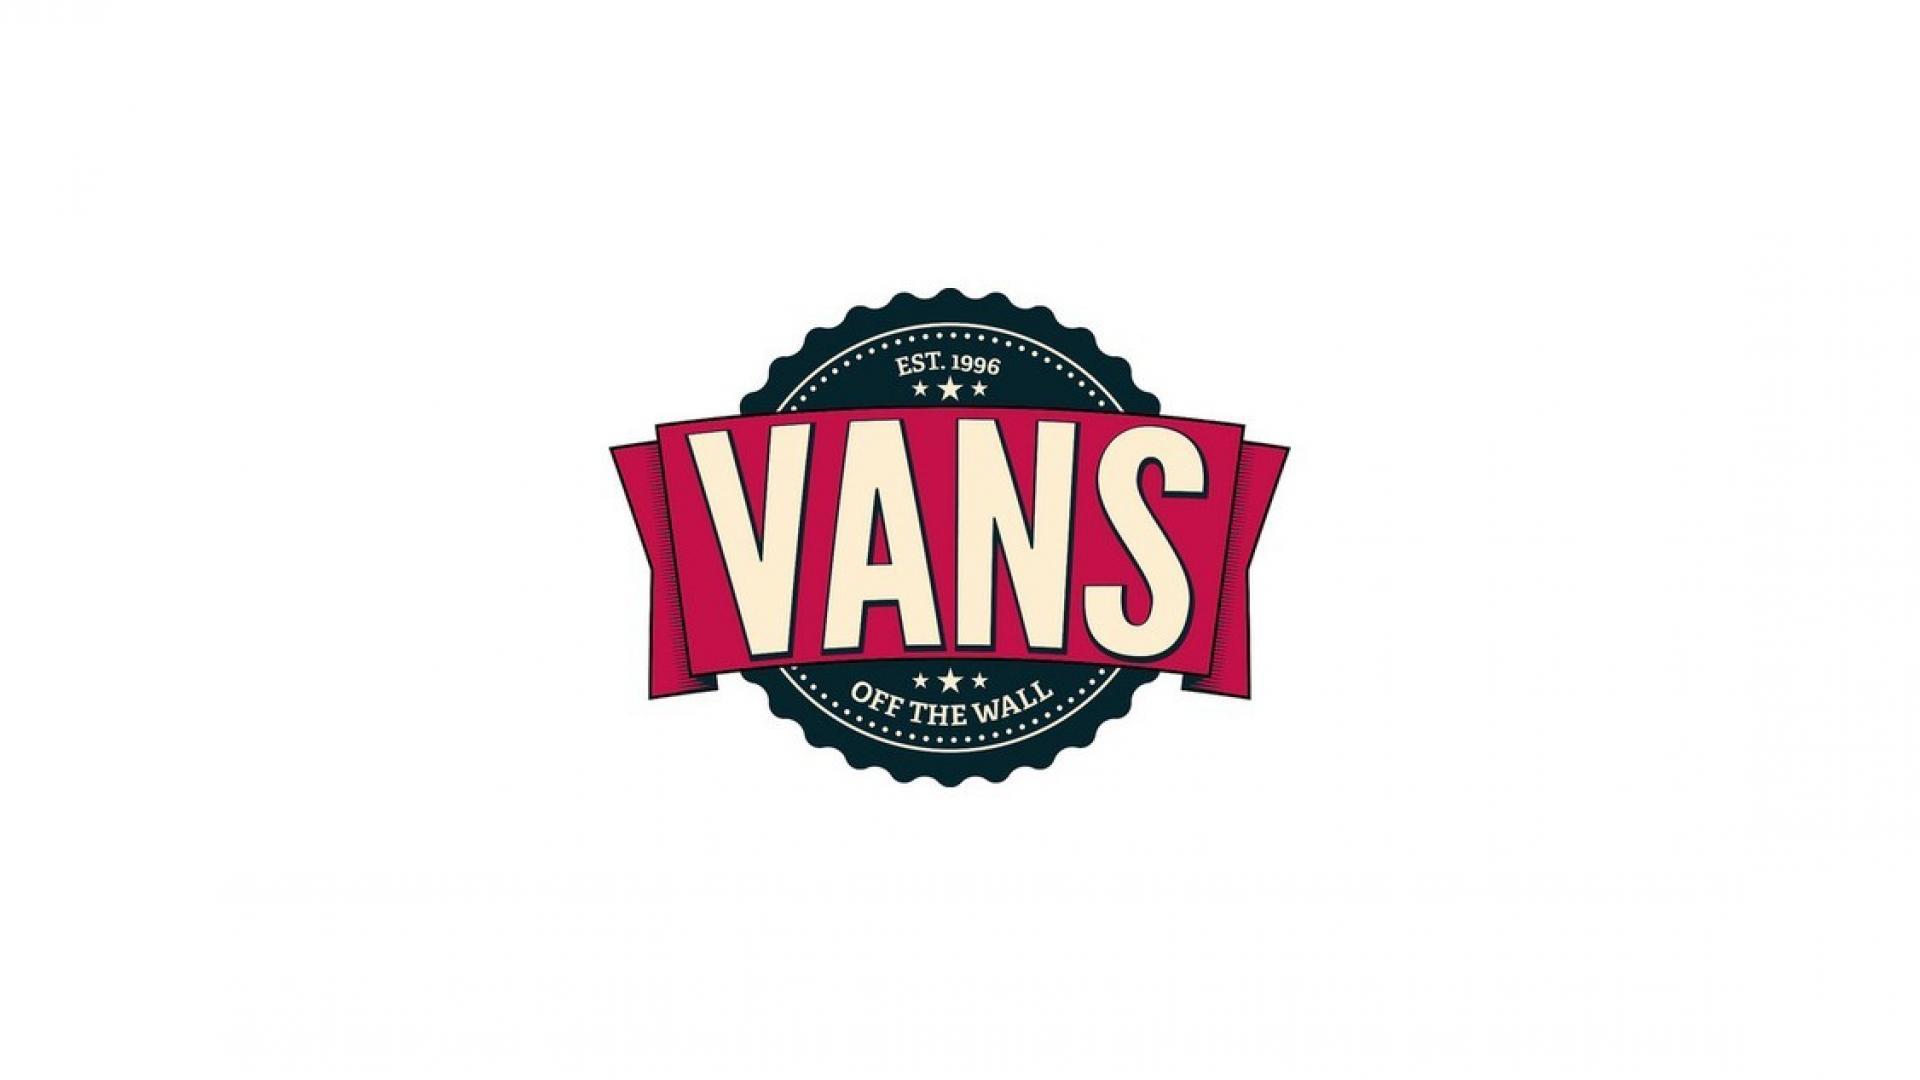 vans wallpaper hd 1920x1080